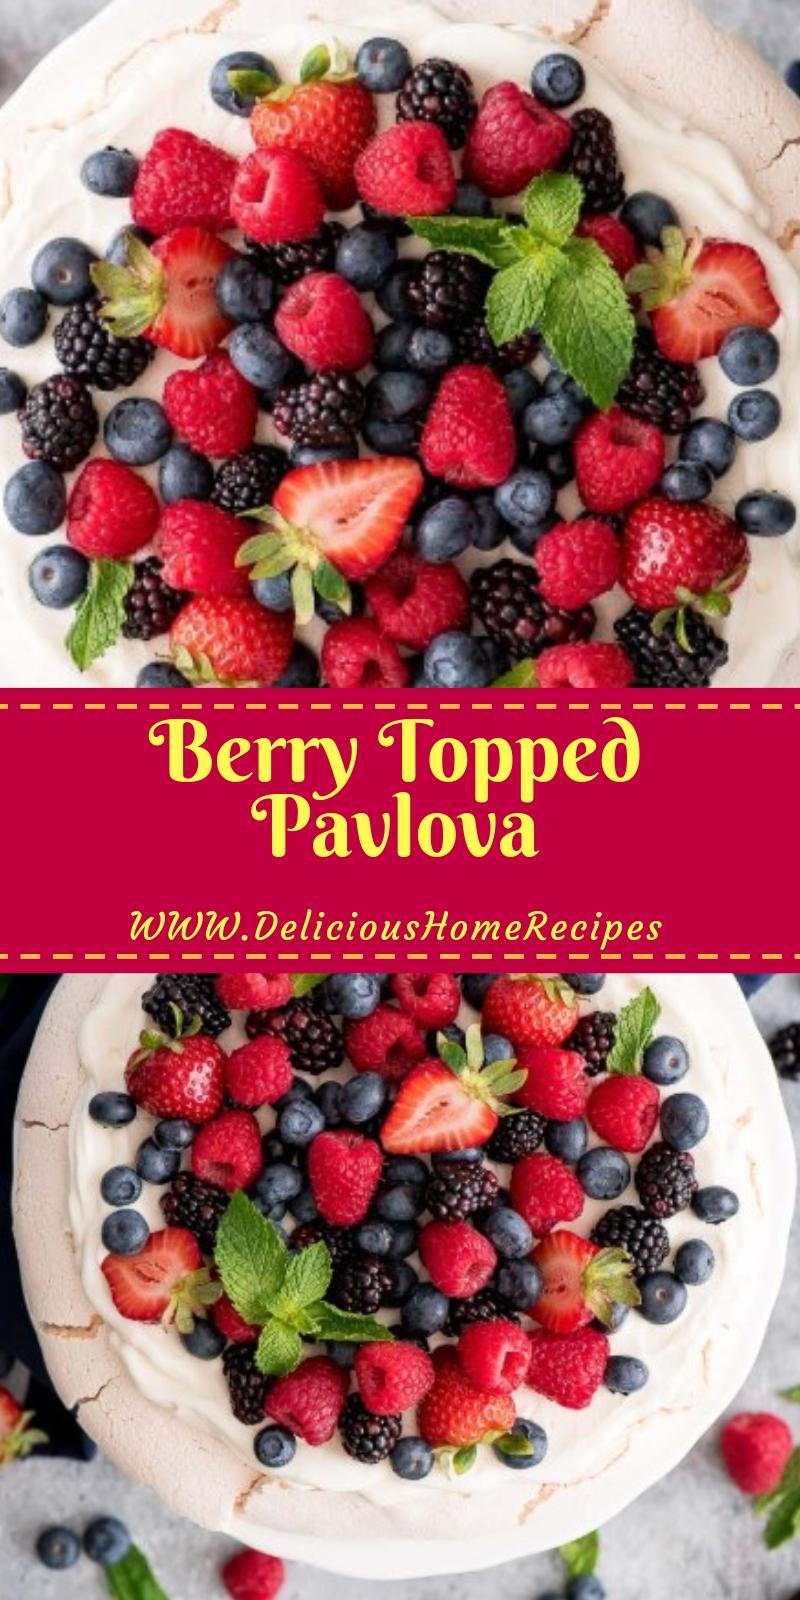 Berry Topped Pavlova